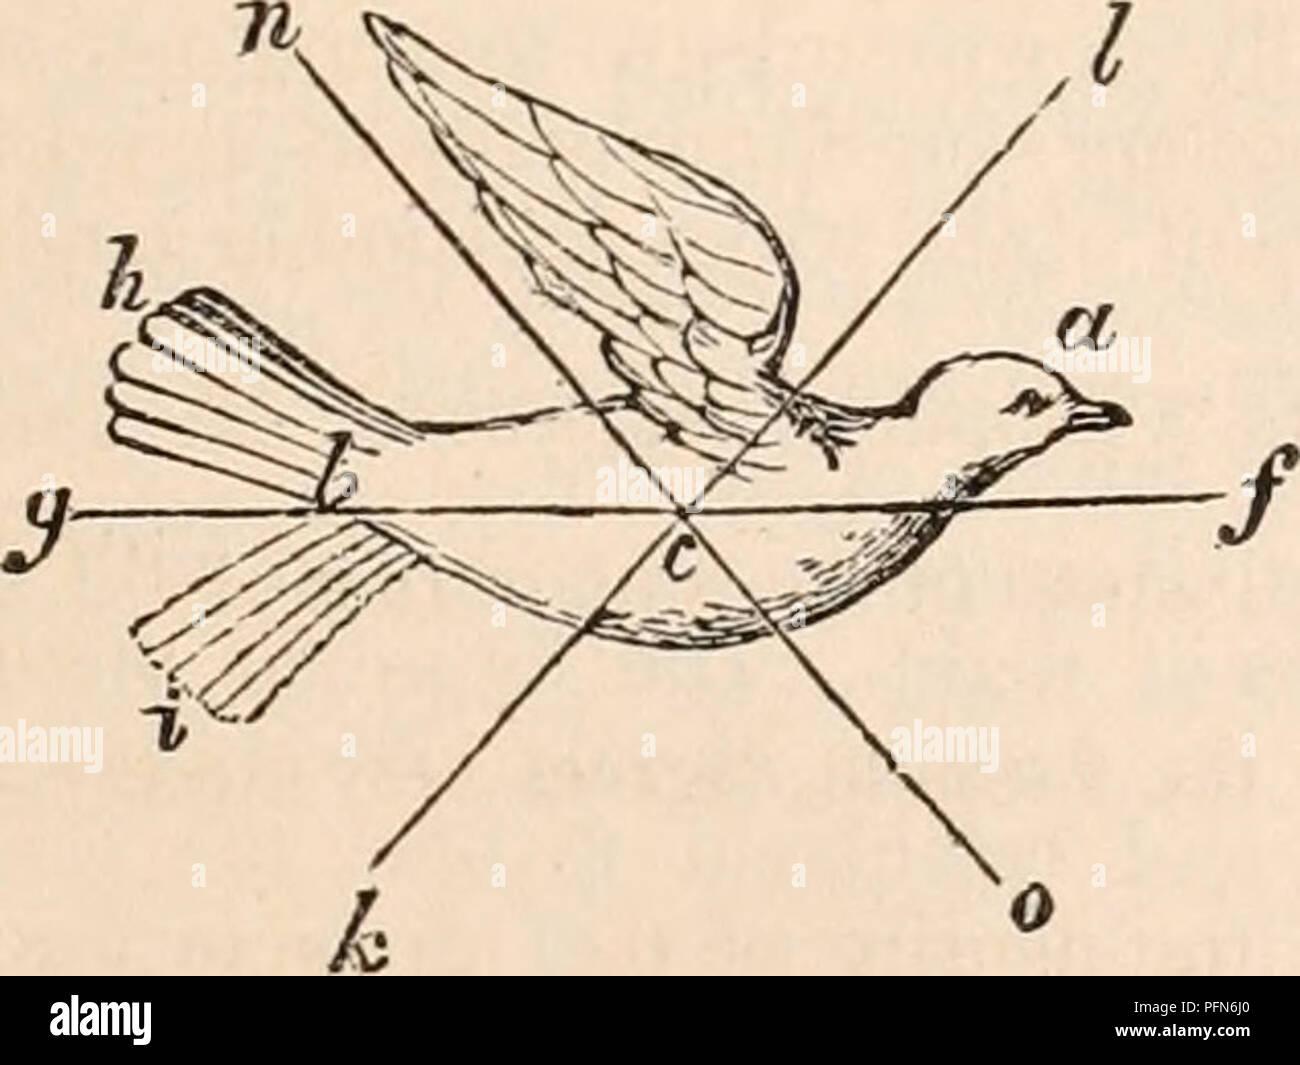 Prevent Pigeons Imágenes De Stock & Prevent Pigeons Fotos De Stock ...